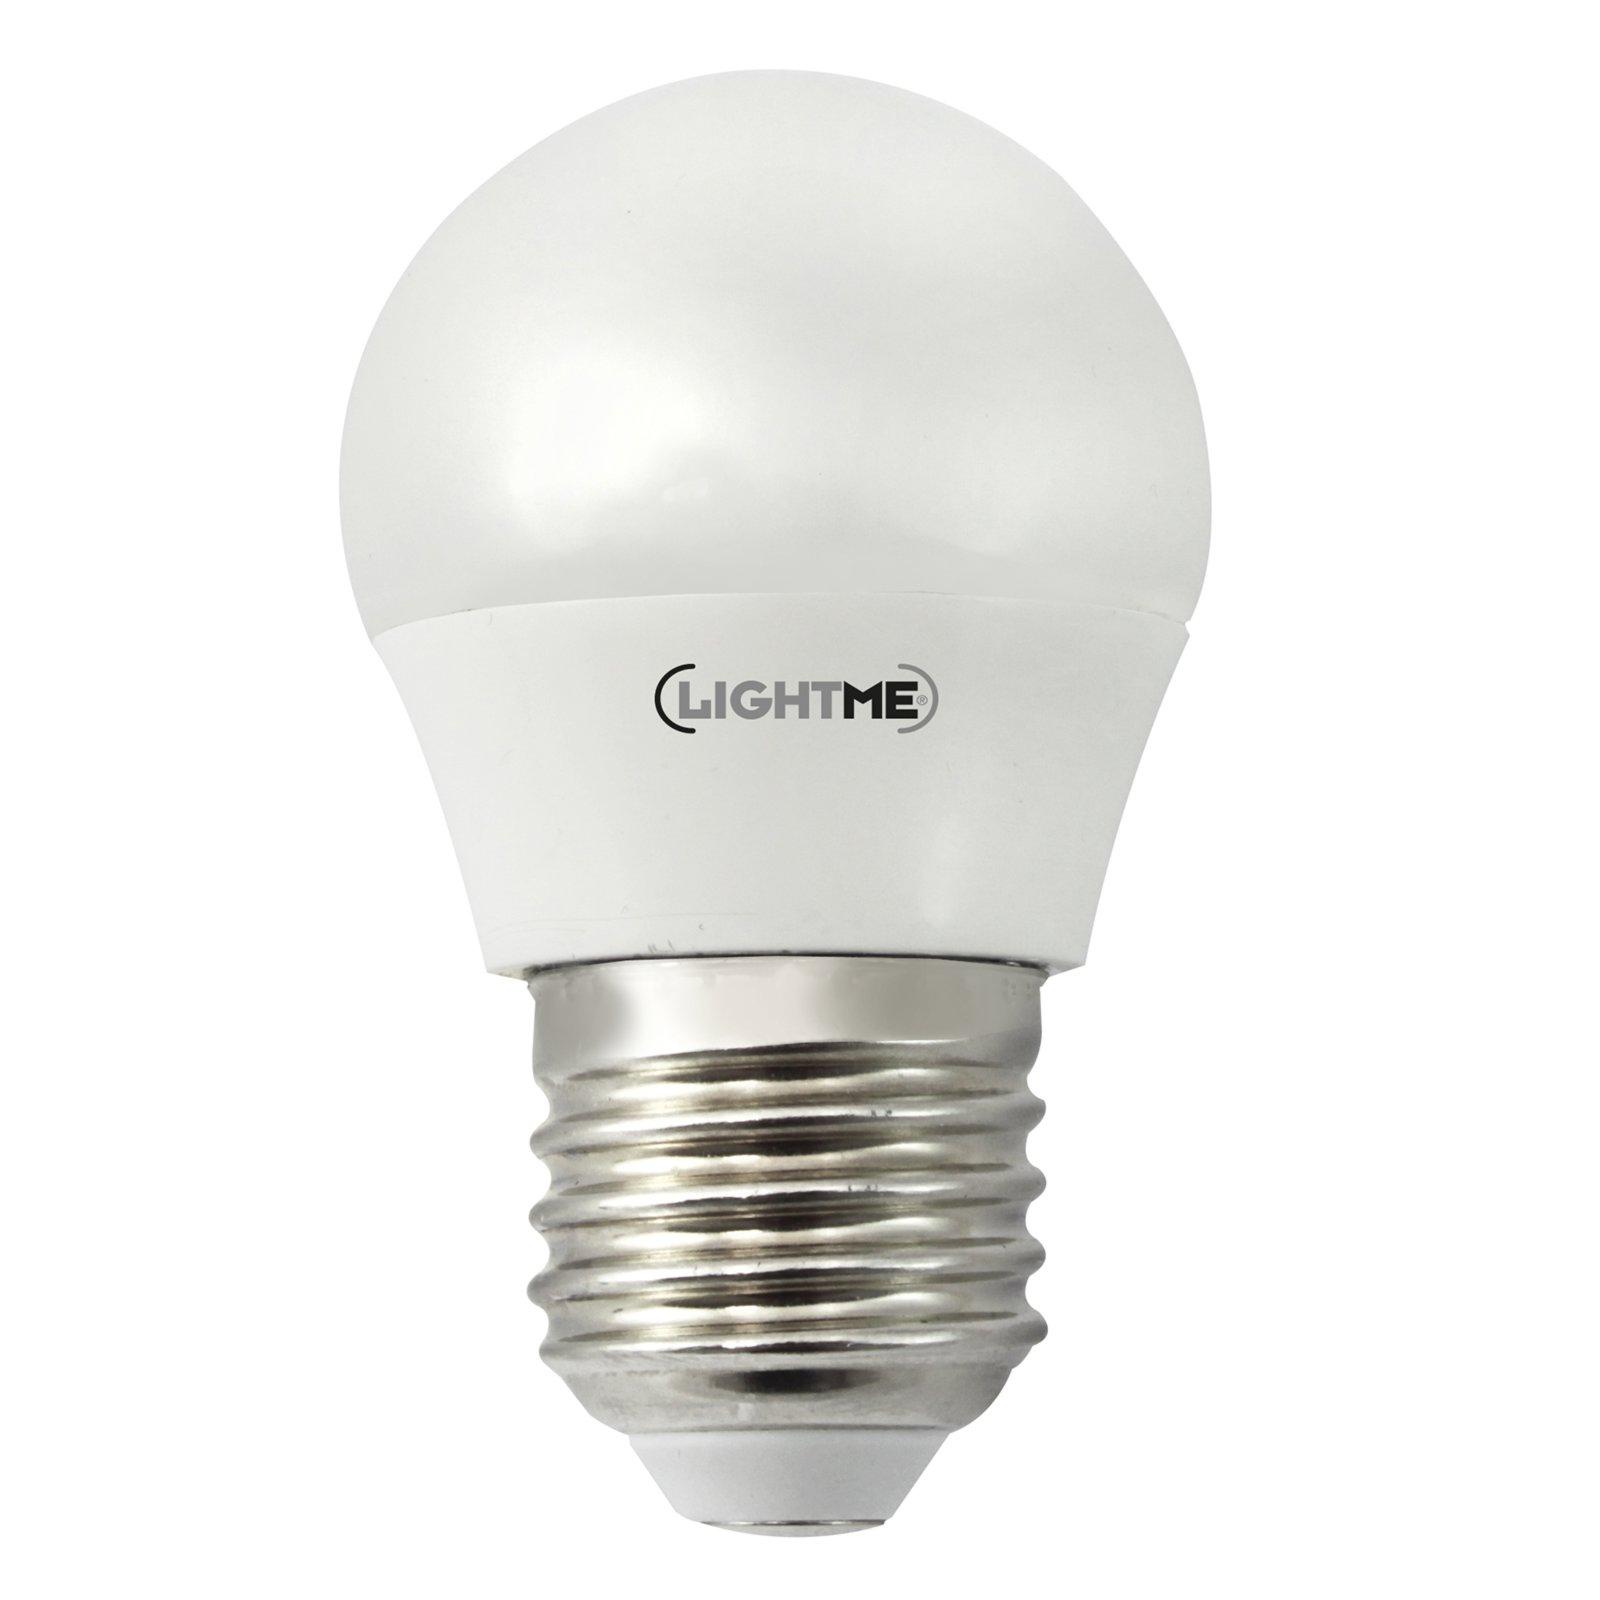 led leuchtmittel tropfen lightme e27 5 5 watt warmwei led leuchtmittel leuchtmittel. Black Bedroom Furniture Sets. Home Design Ideas